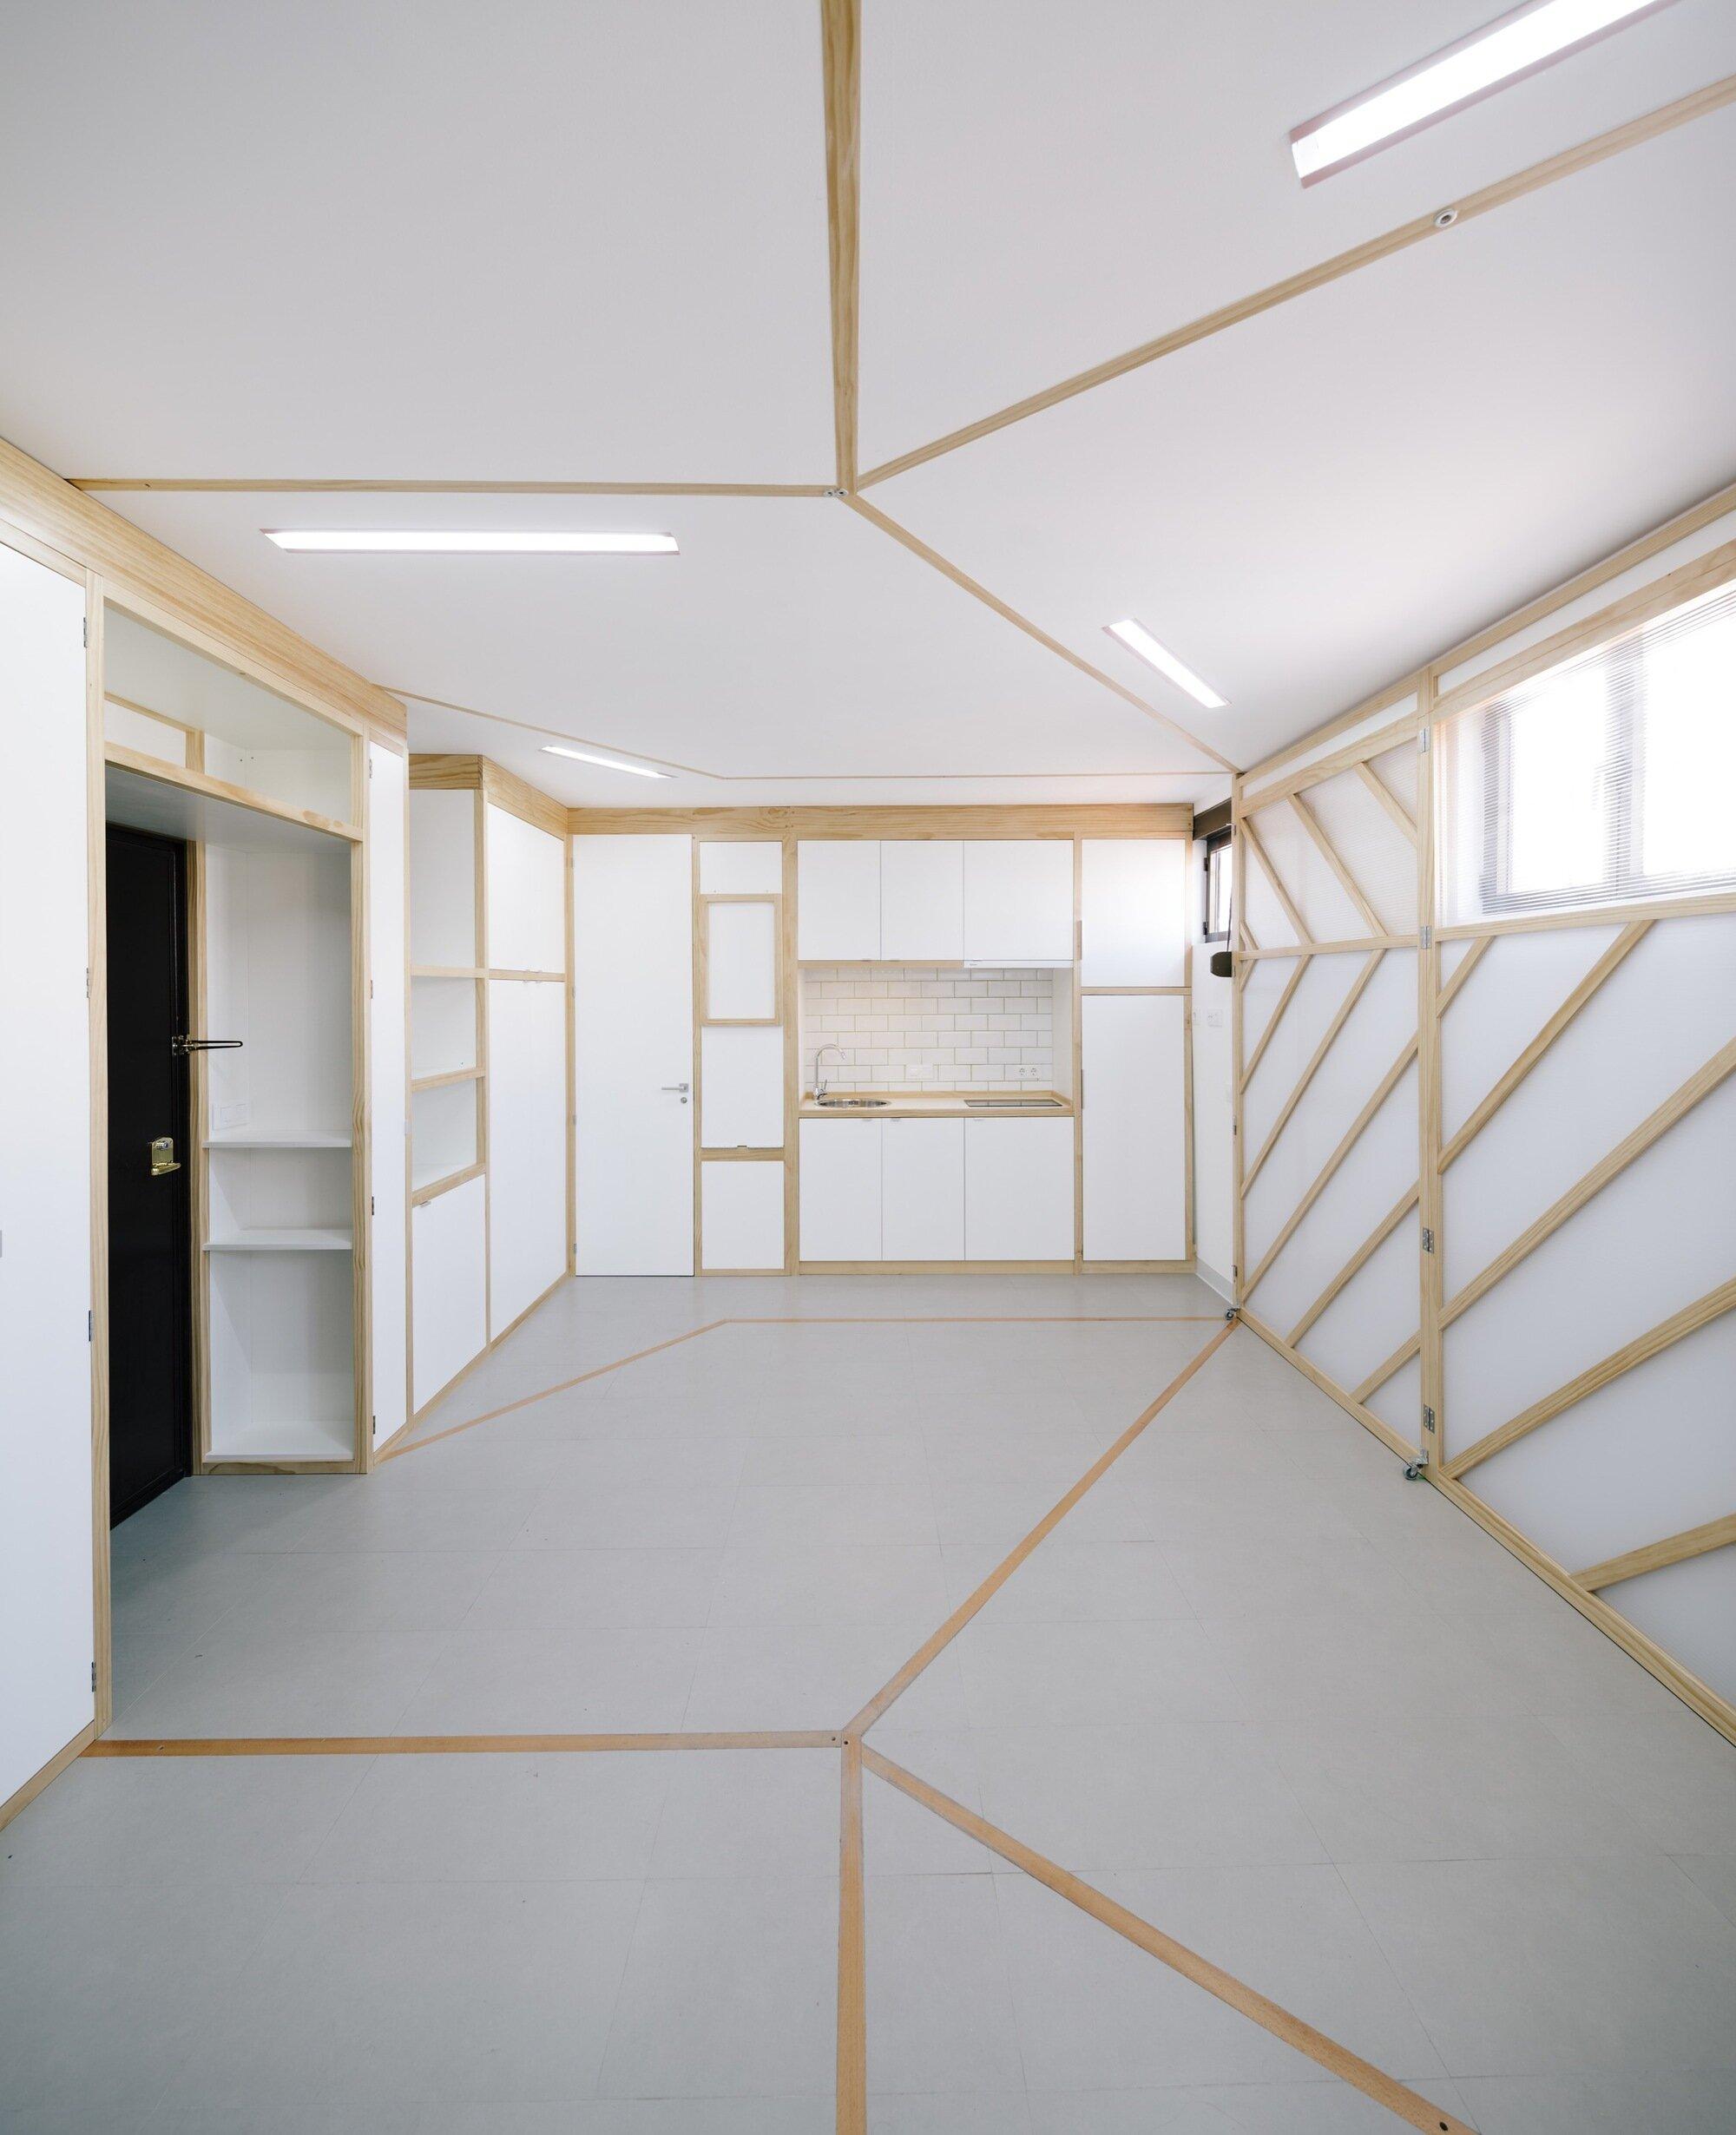 Biombombastic - elii - Spain - Whole Room - Humble Homes